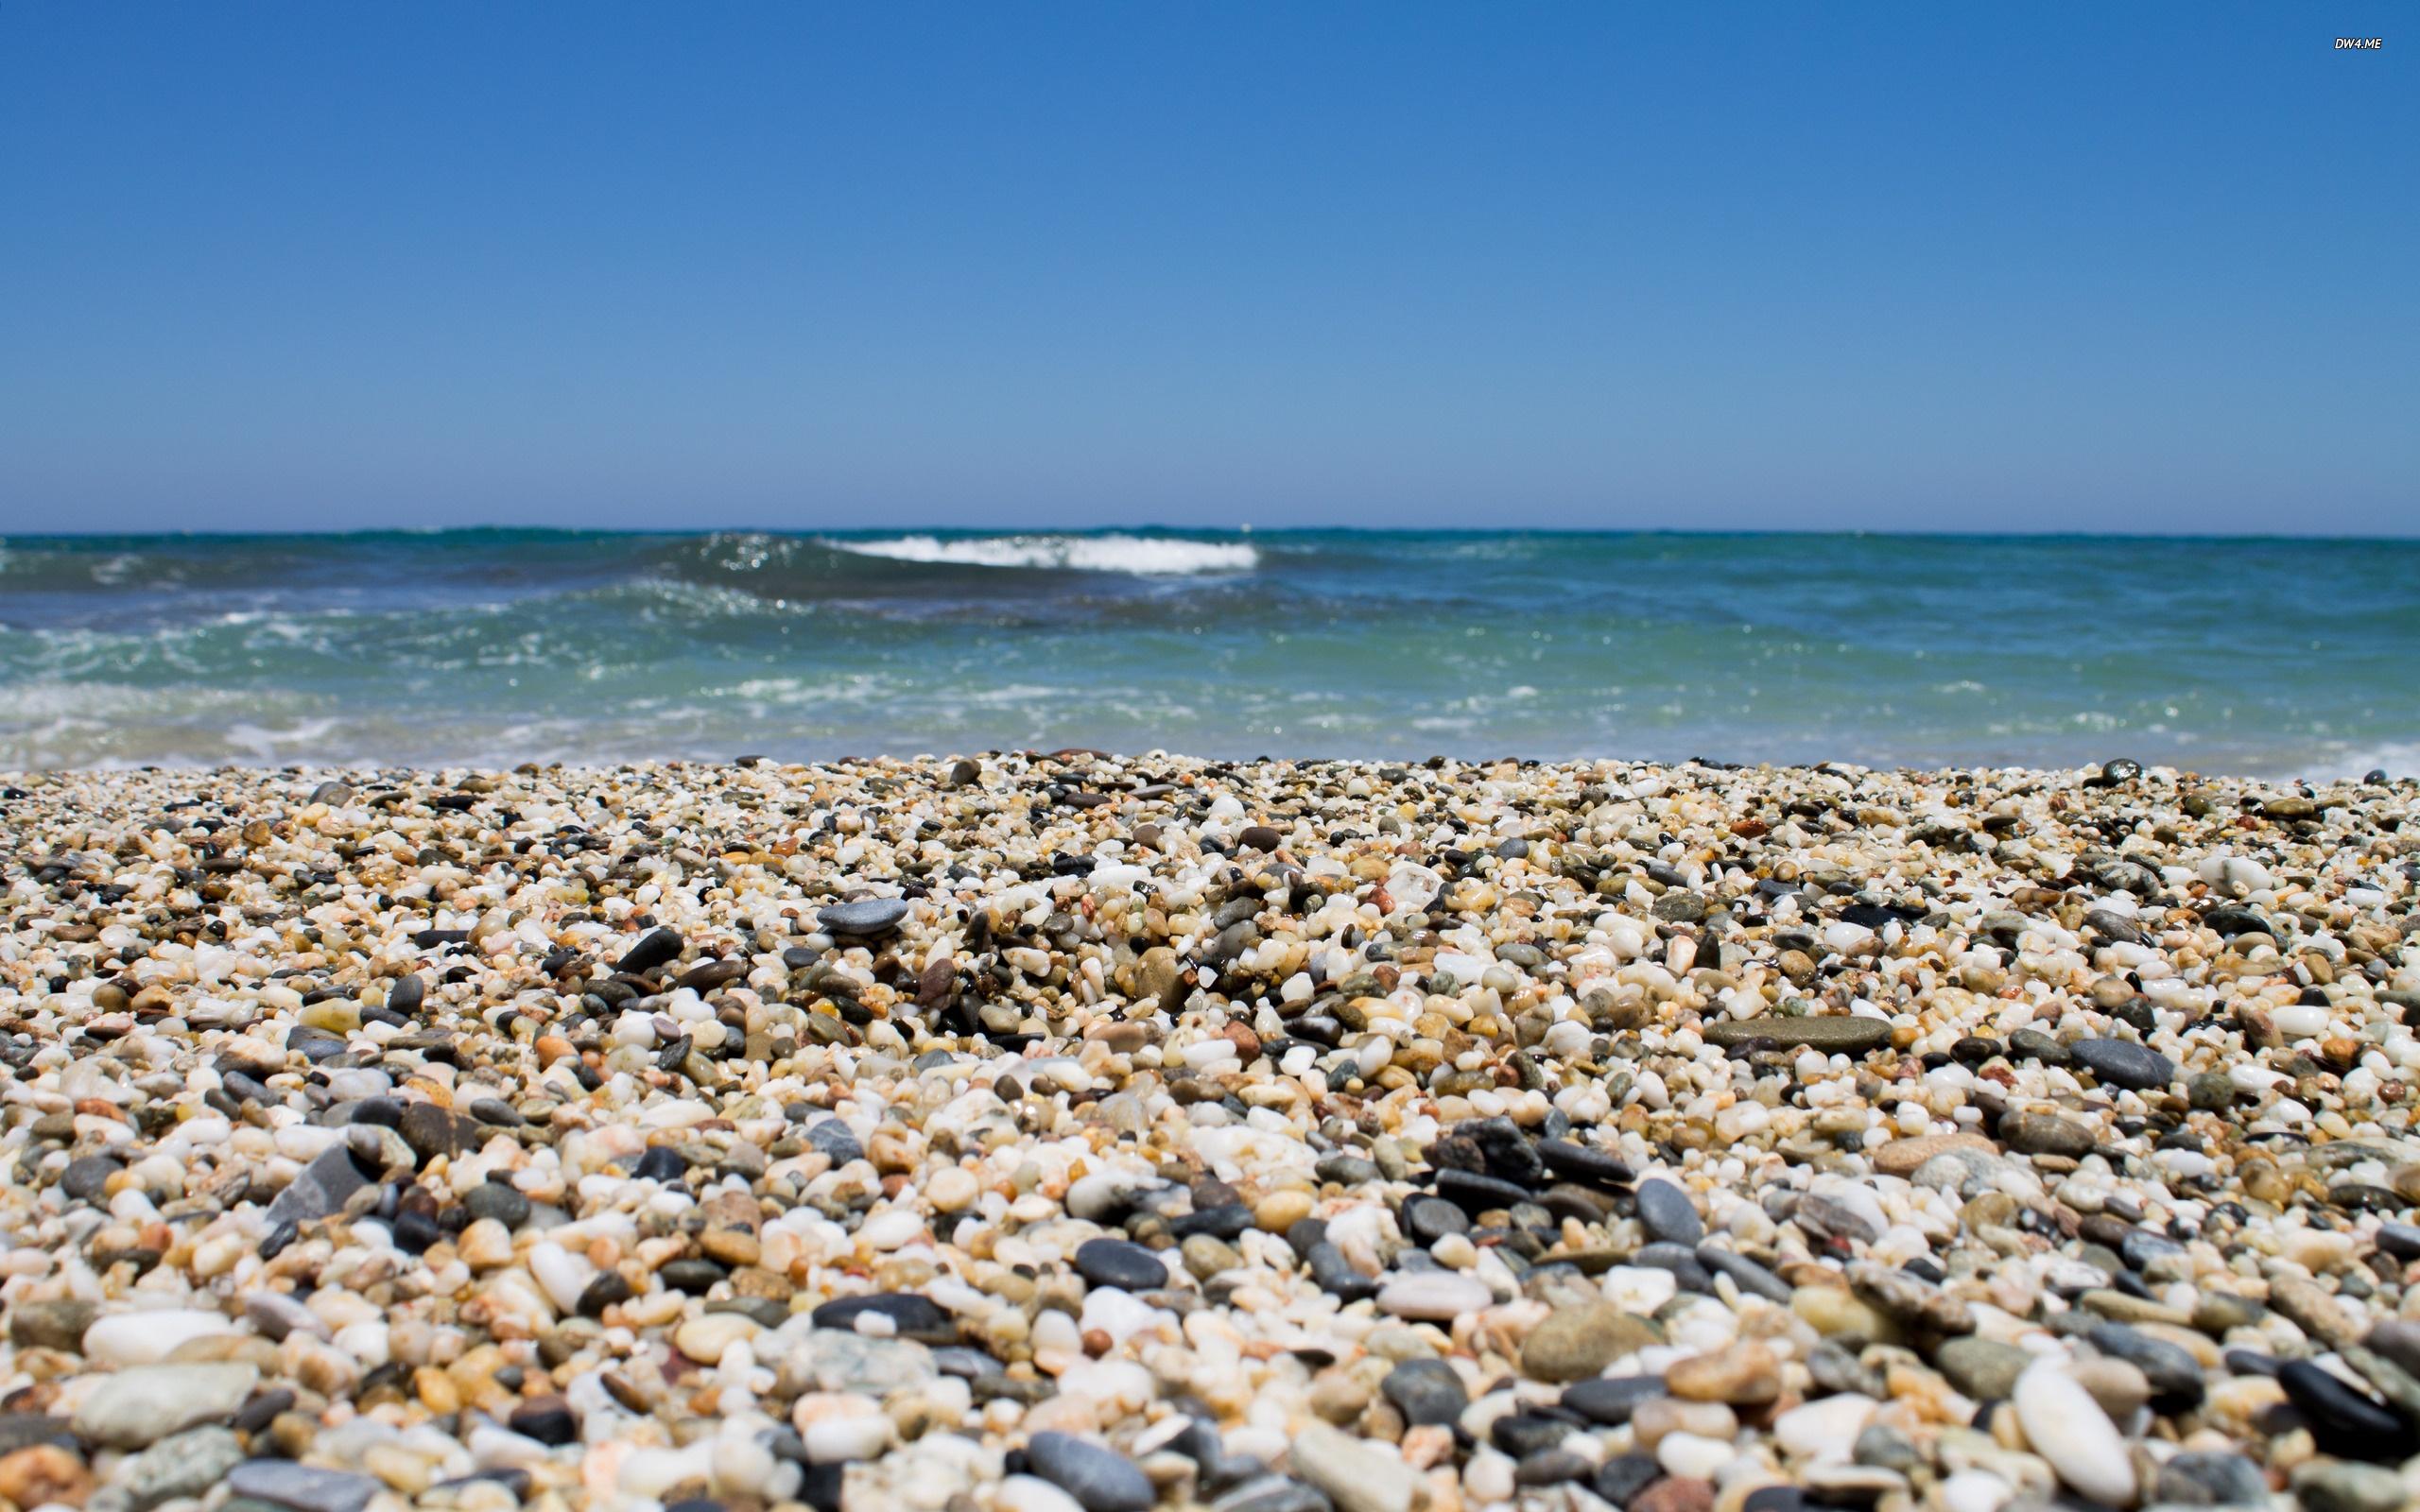 Big 2365 pebbles on the beach 2560x1600 beach wallpaper